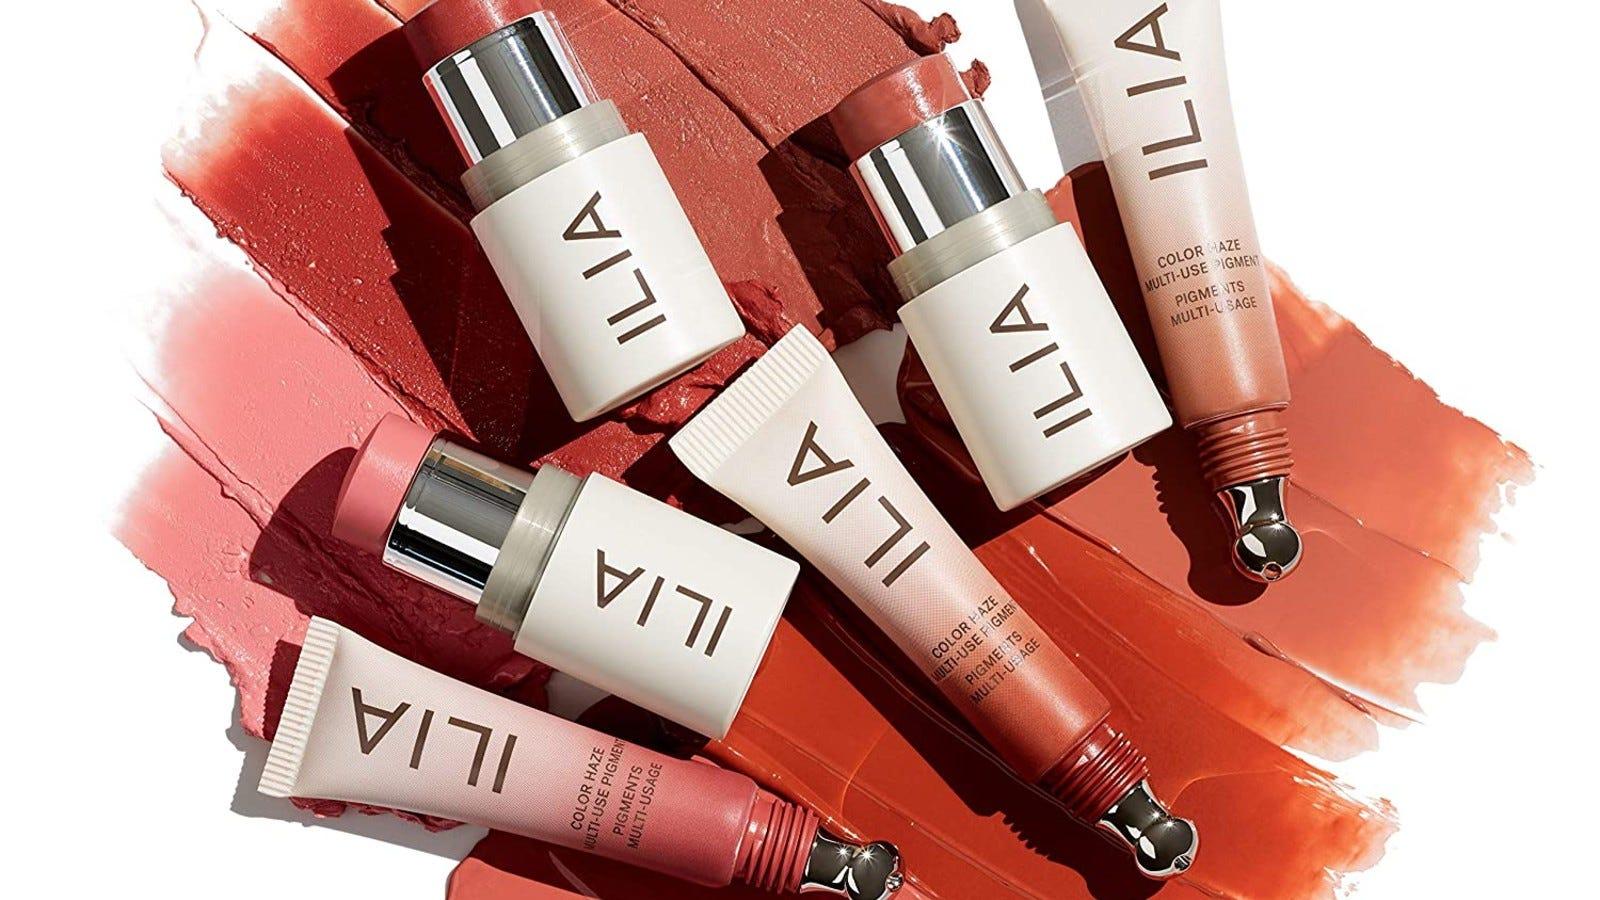 Ilia skincare products on makeup